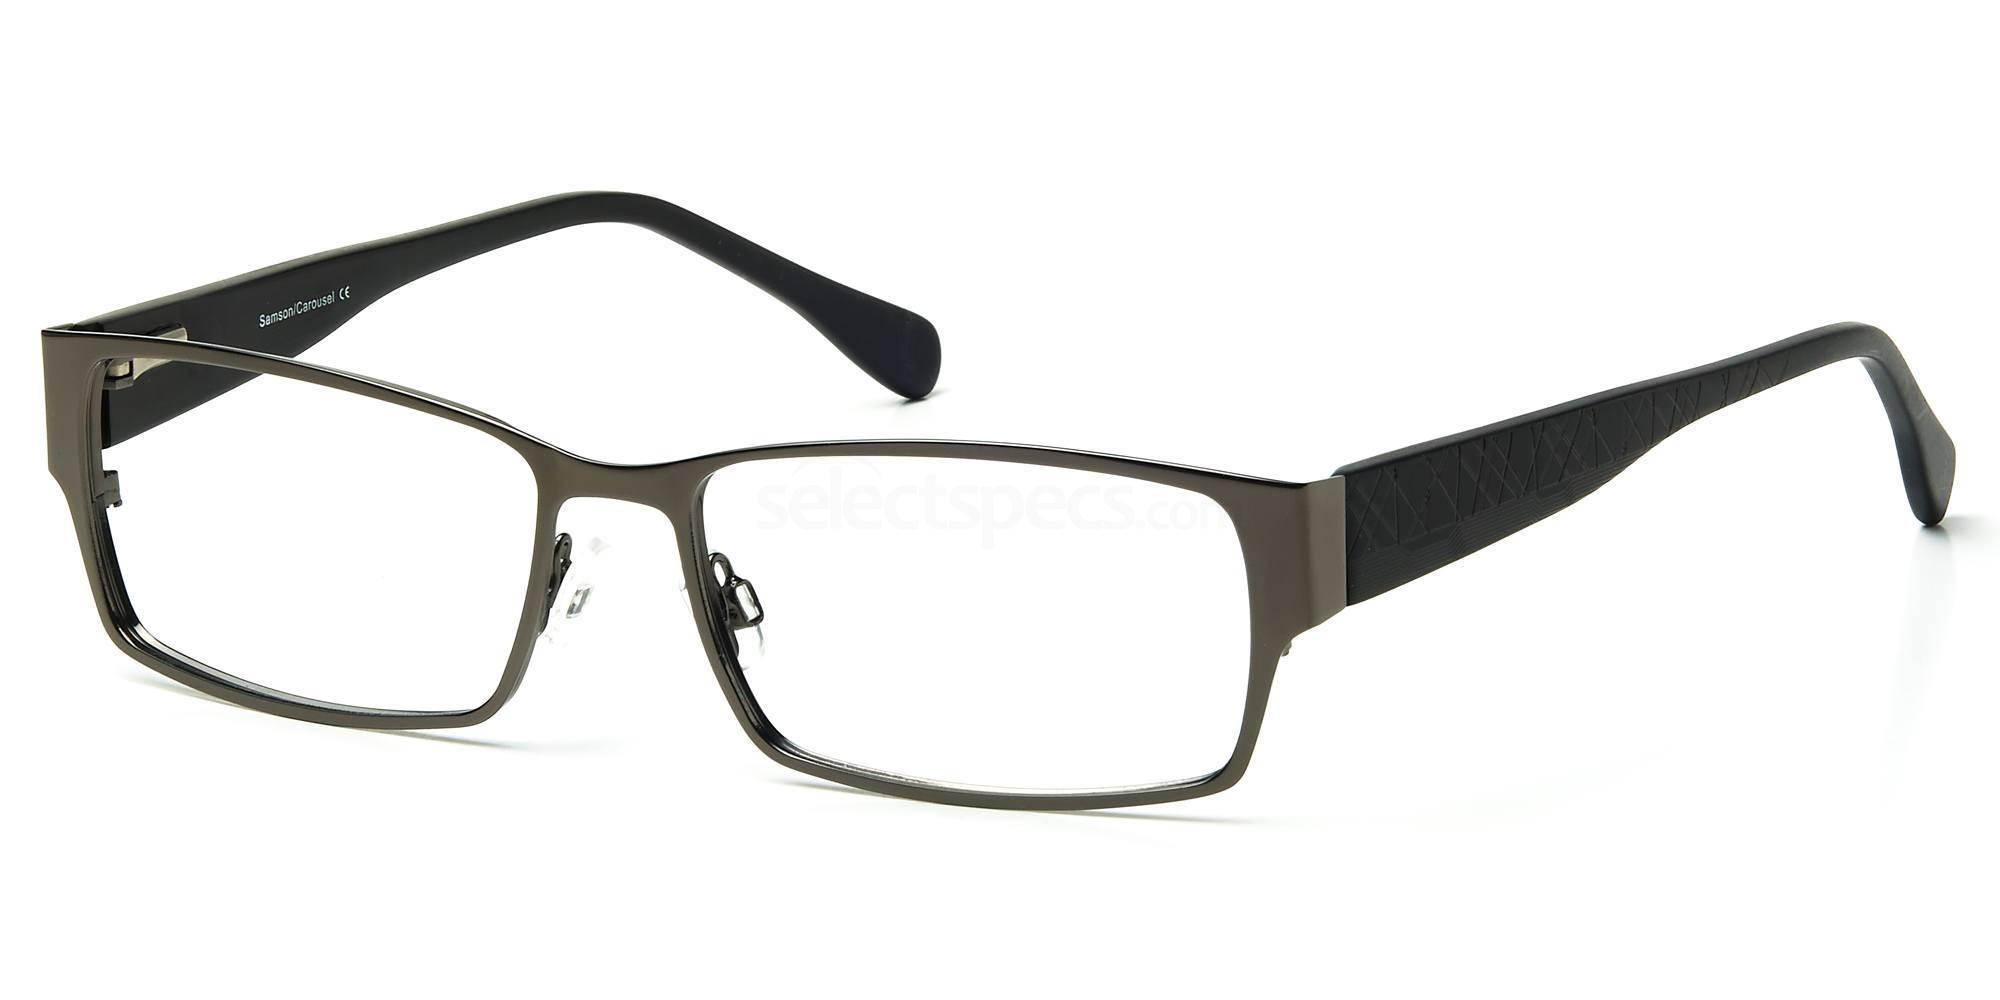 C1 SAMSON01 Glasses, Samson